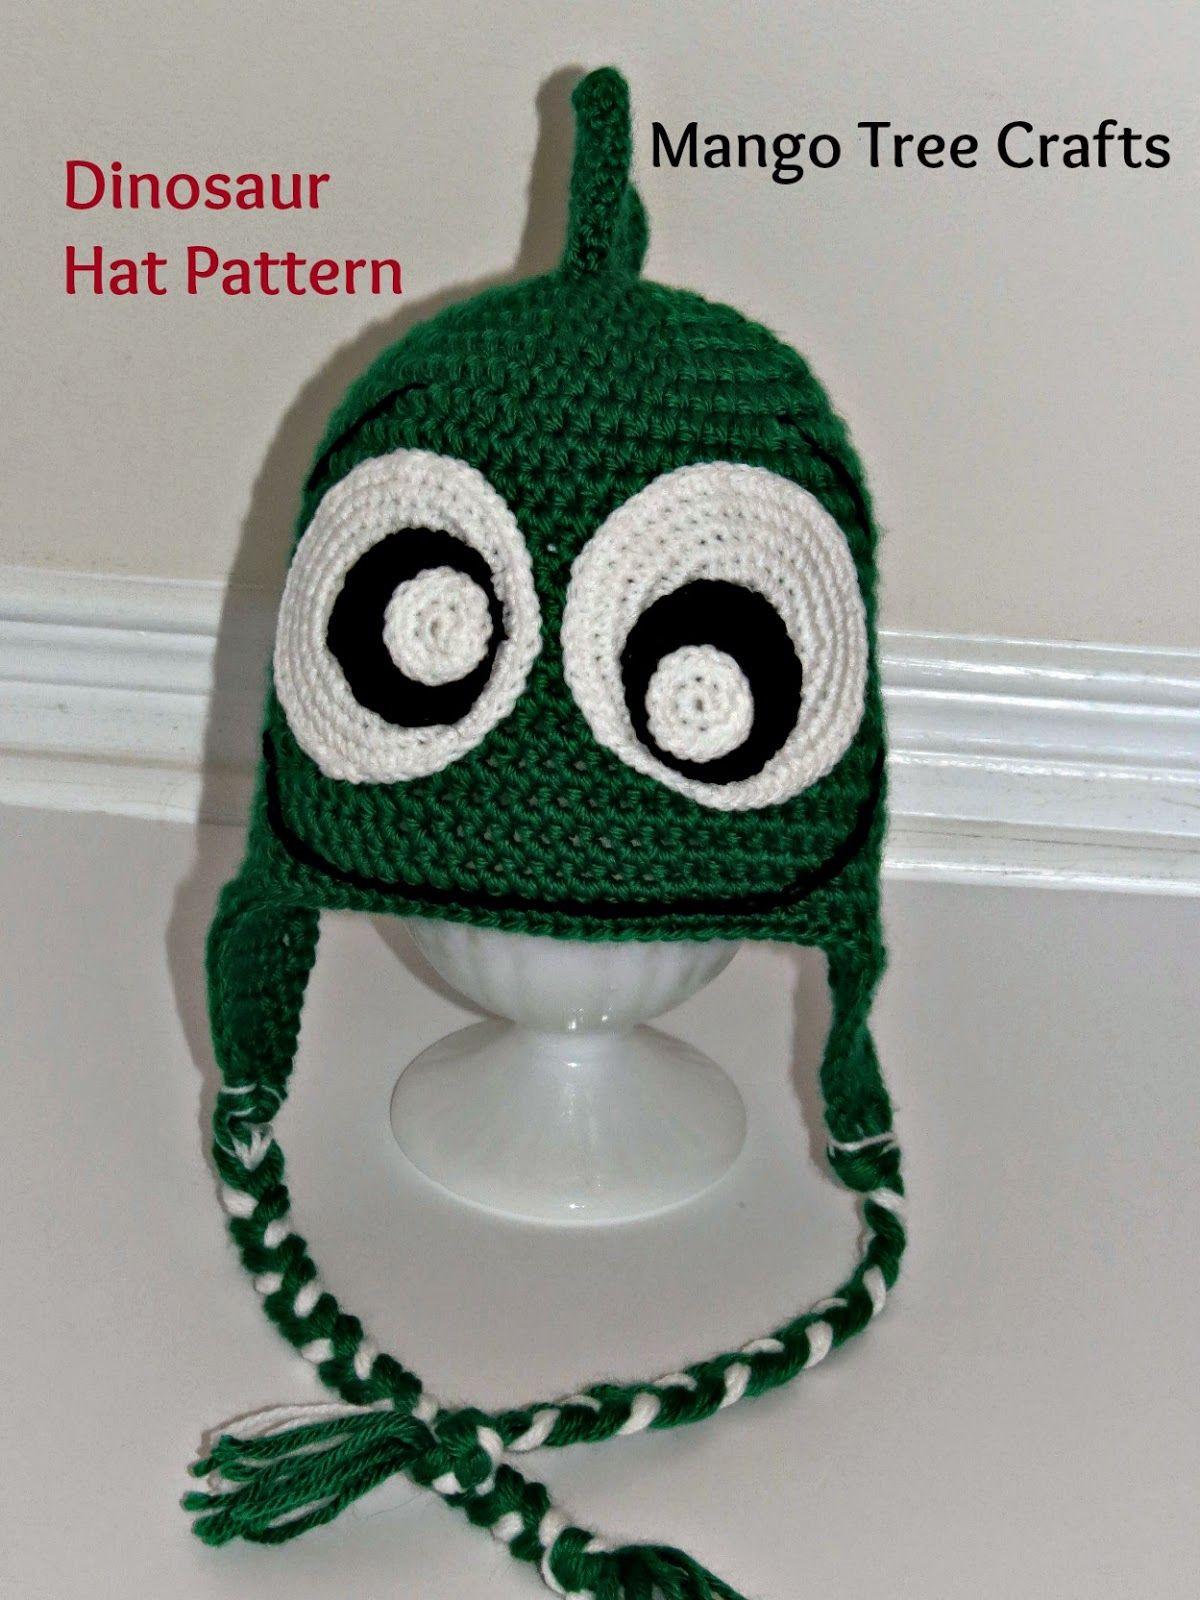 Mango Tree Crafts: Crochet Dinosaur Hat Pattern | Crochet ideas and ...